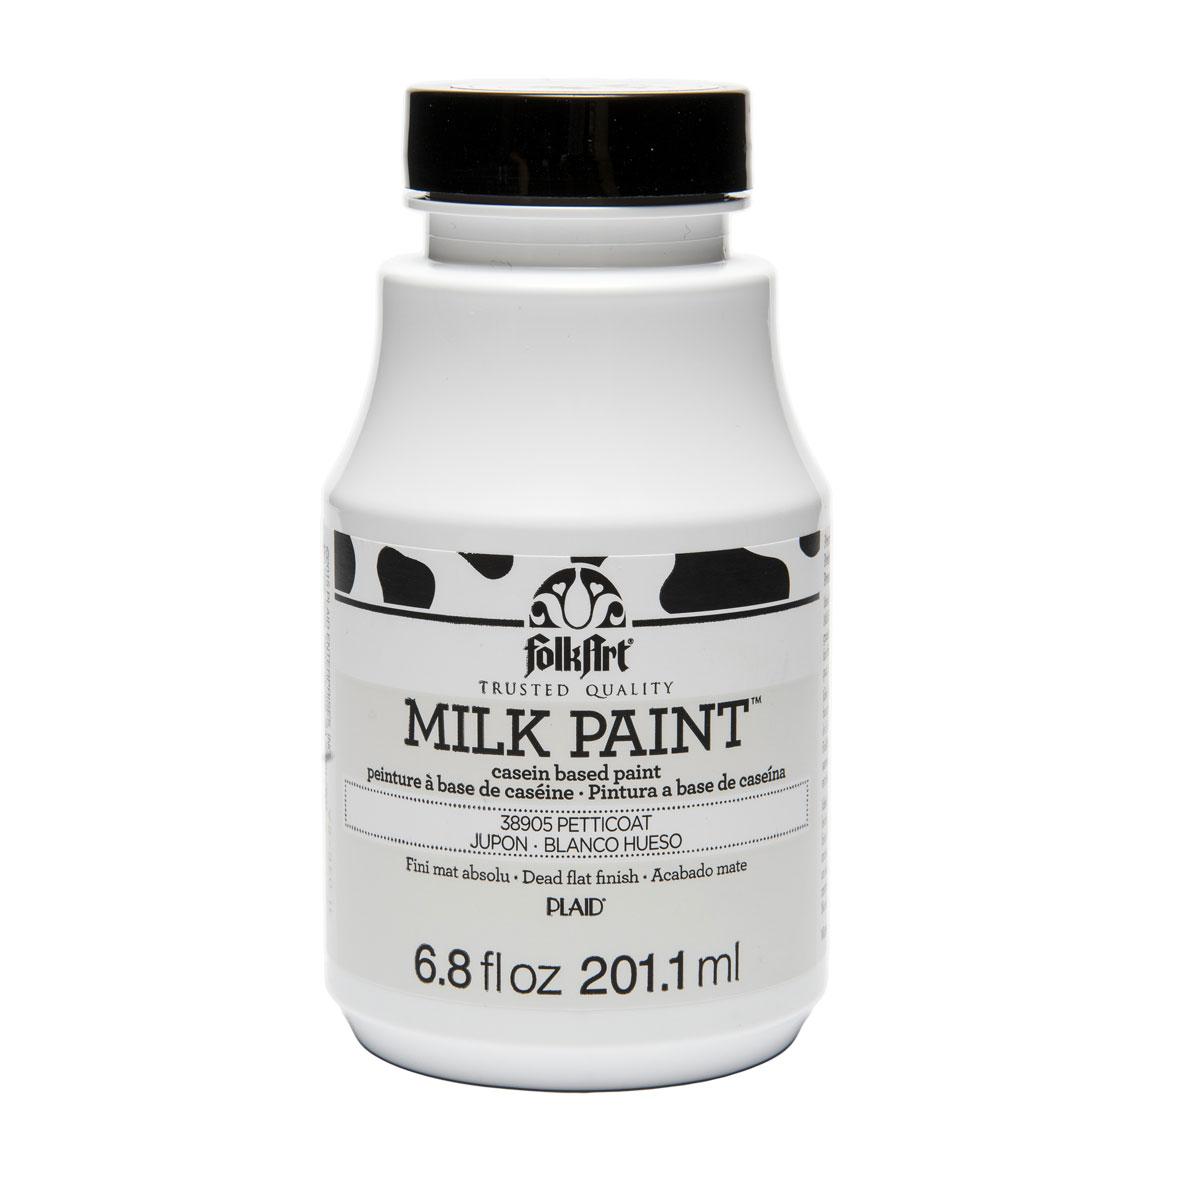 FolkArt ® Milk Paint™ - Petticoat, 6.8 oz.